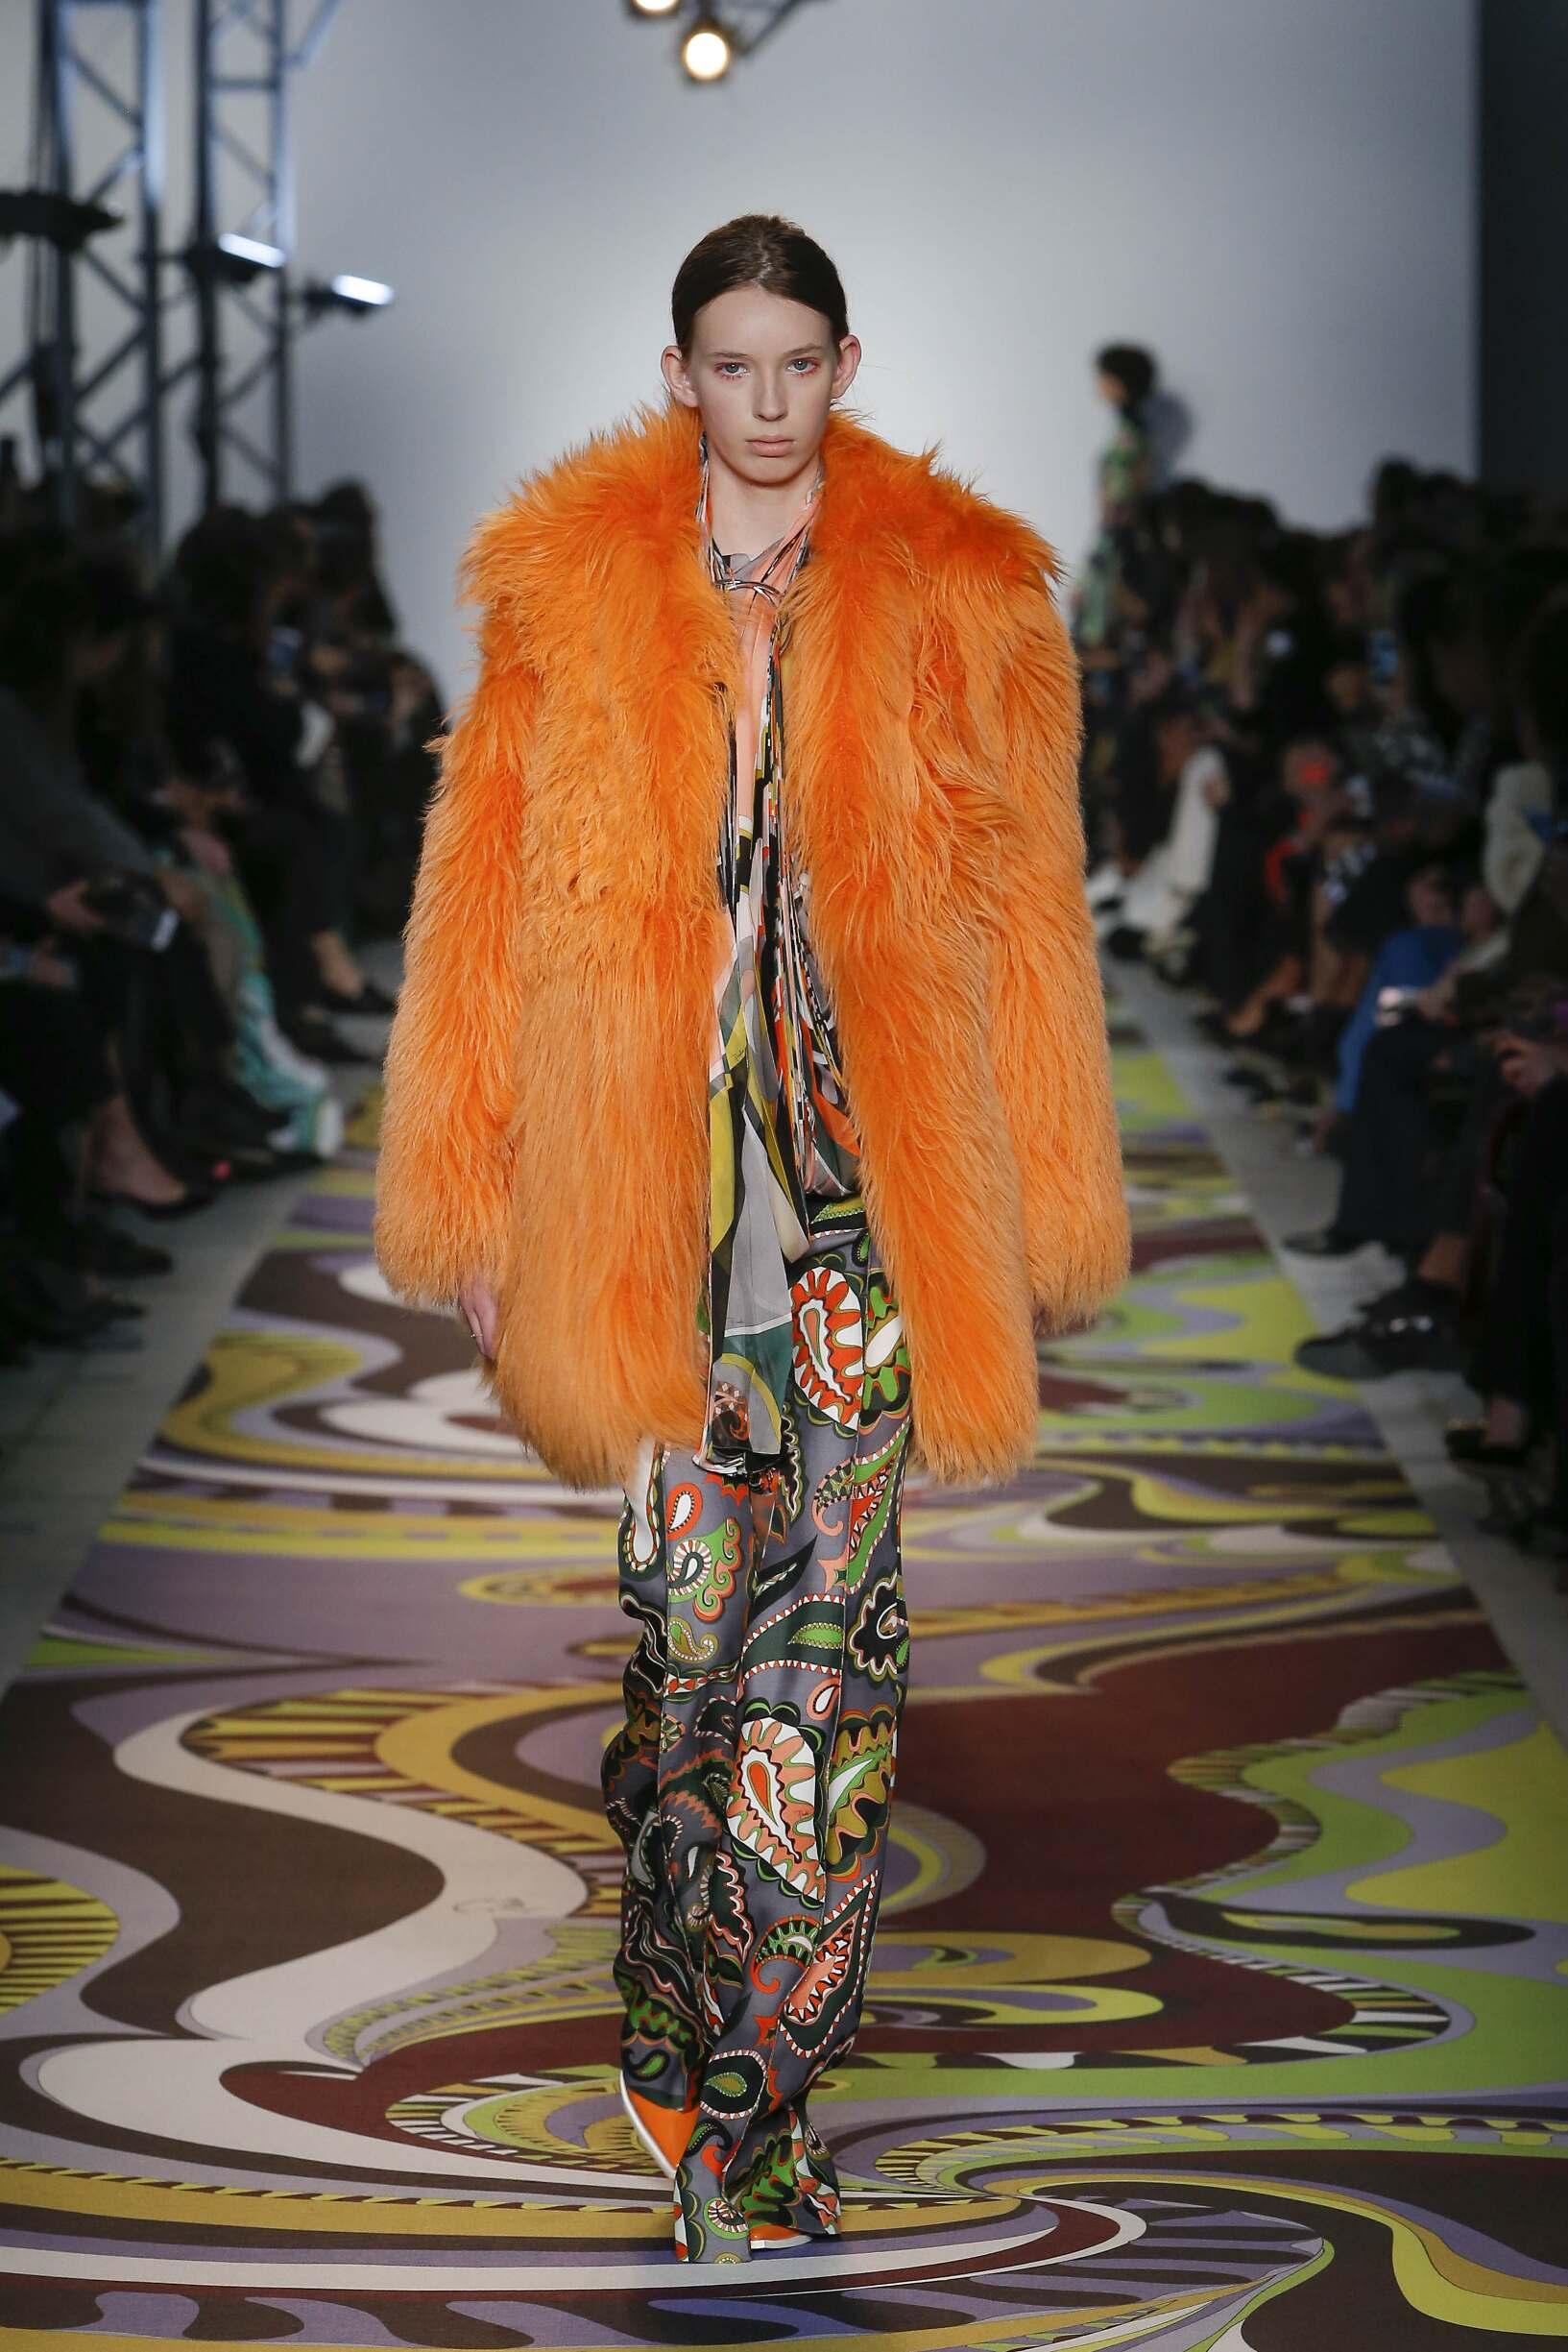 Emilio Pucci Woman Style 2018